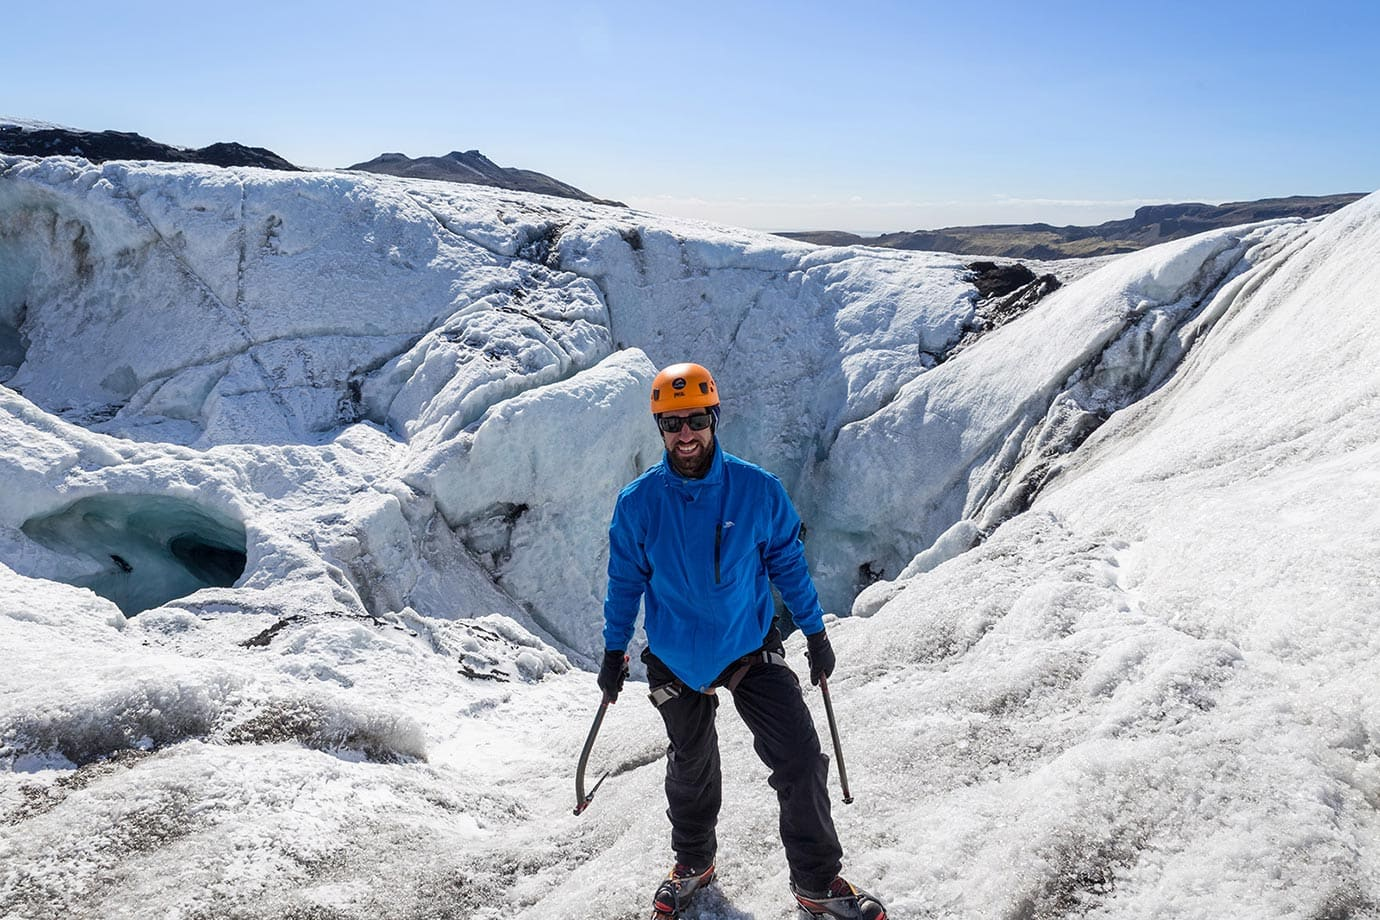 Macca Sherifi ice climbing